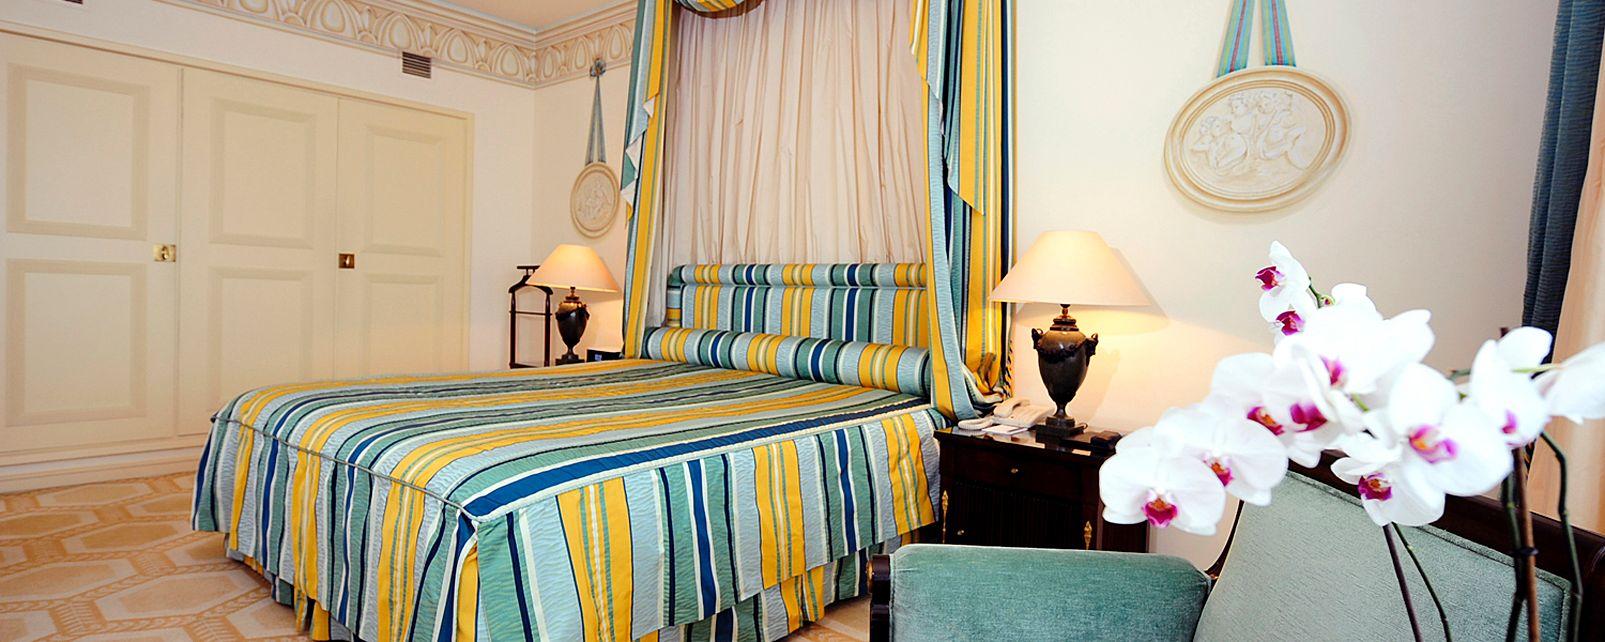 Hotel Four Seasons Ritz Lisbon